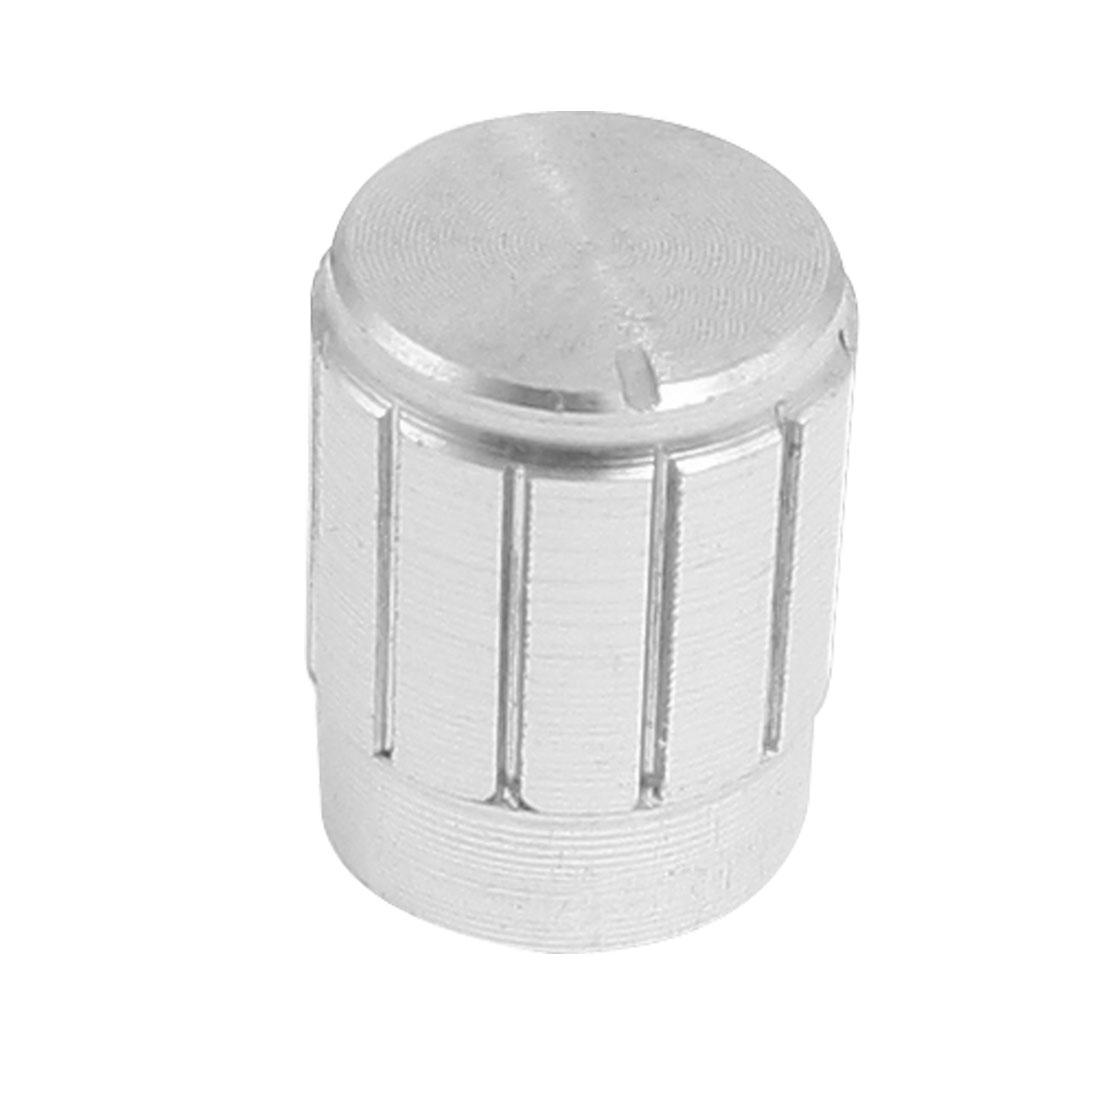 11 x 17mm Potentiometer Control Volume Rotary Knob Cap Silver Tone